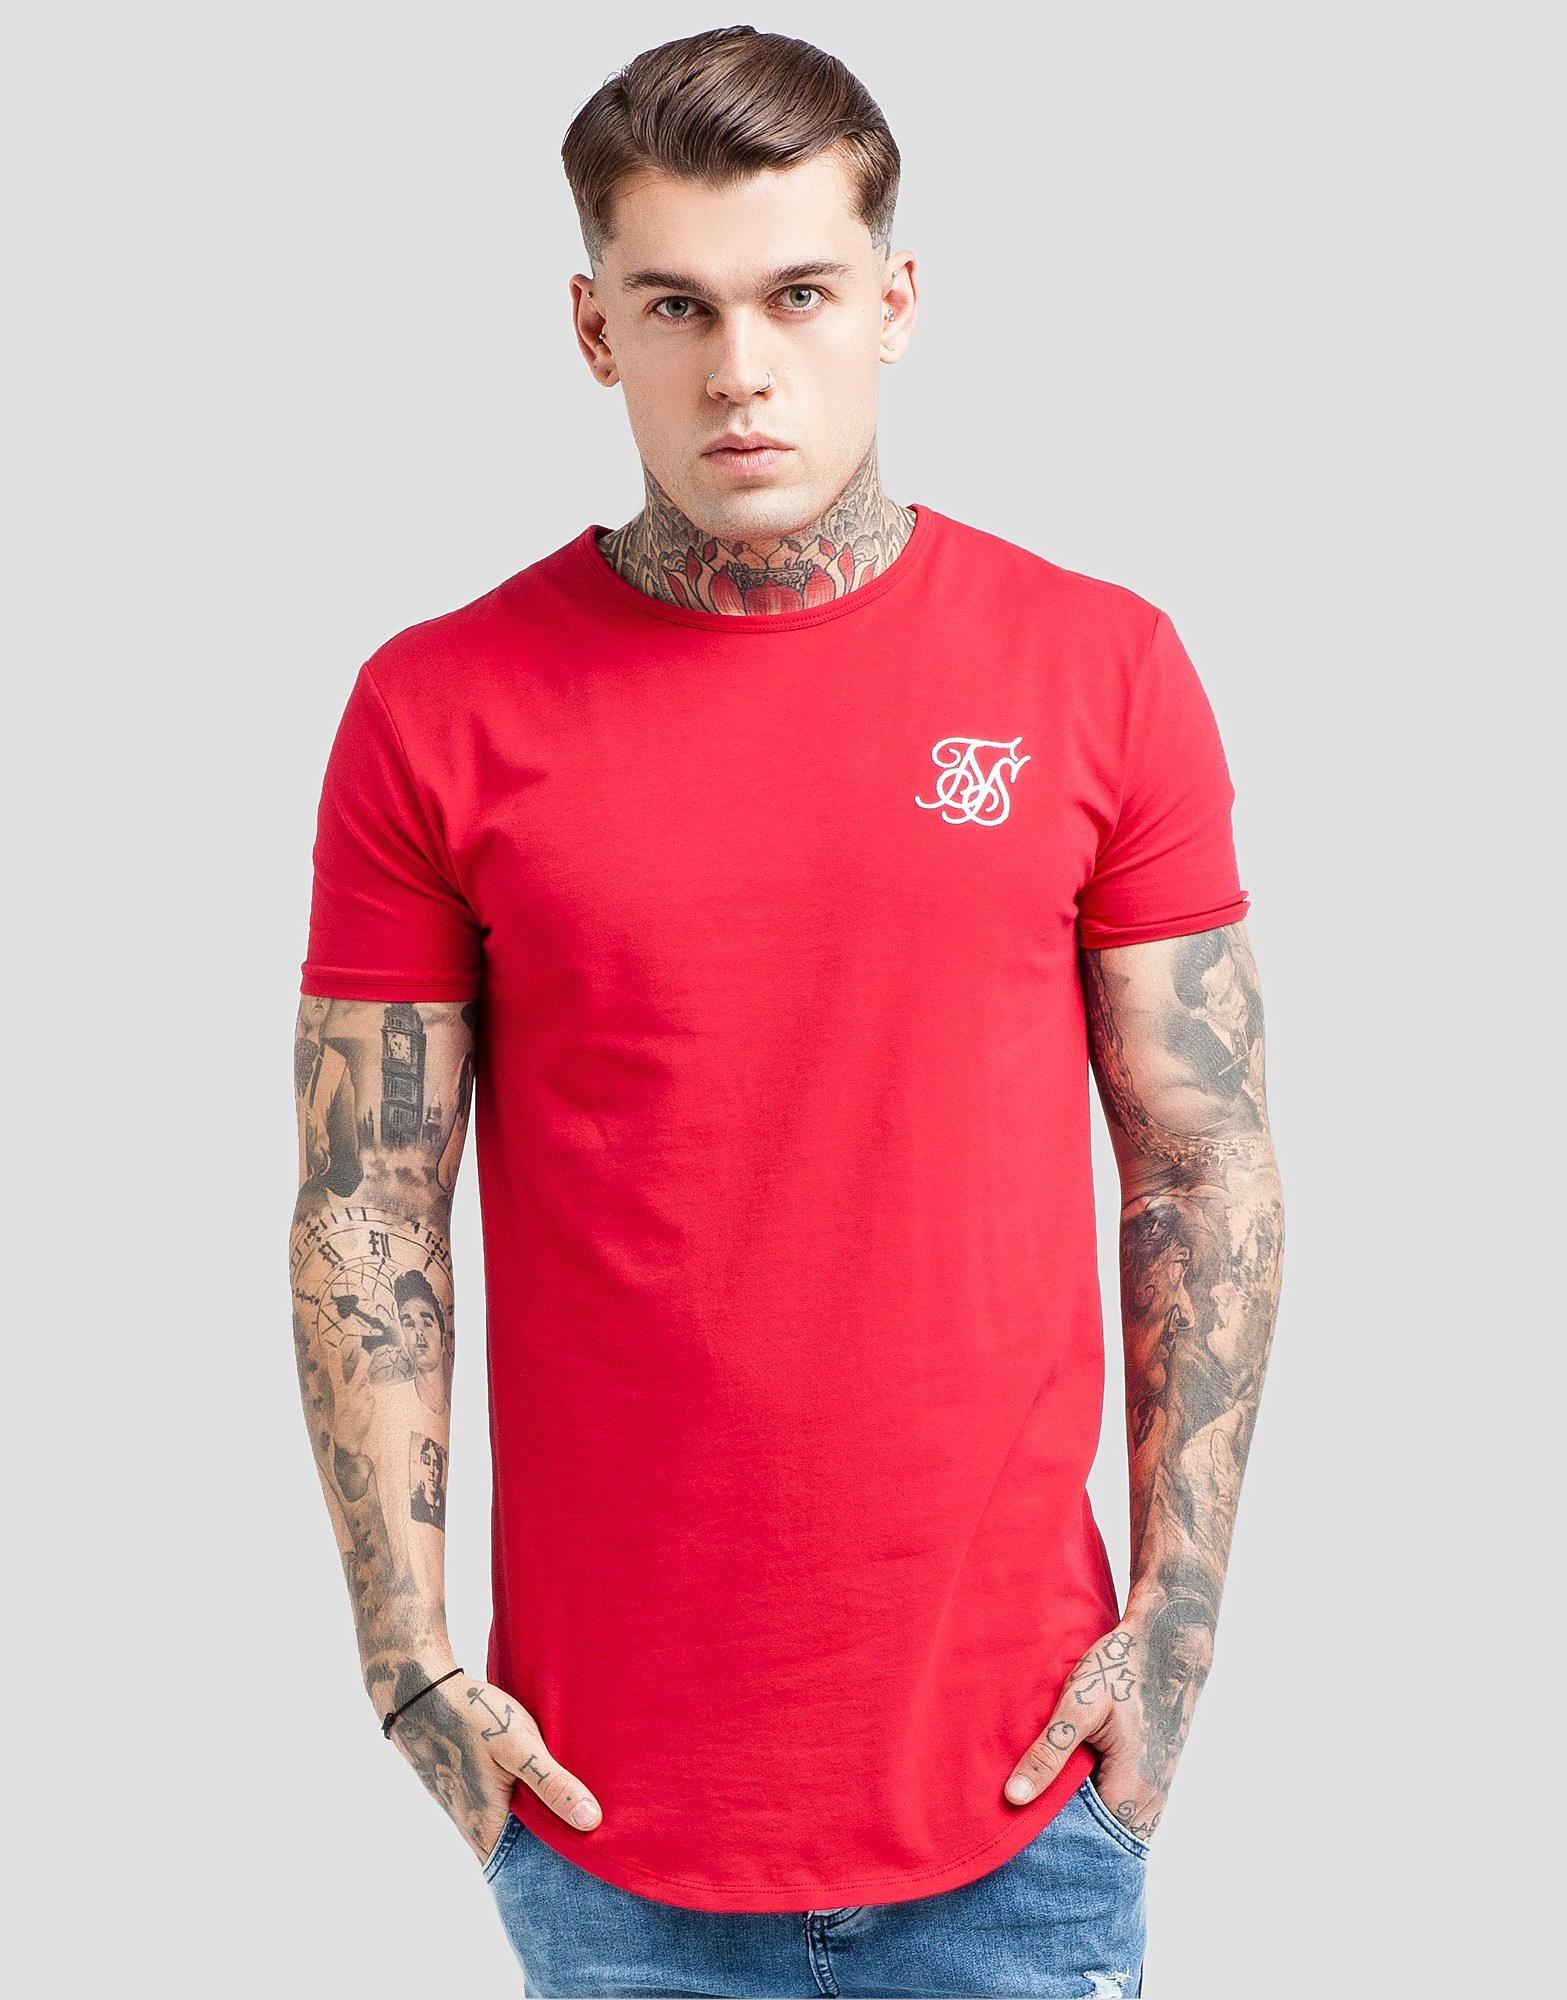 SikSilk Core T-Shirt - Rood - Heren